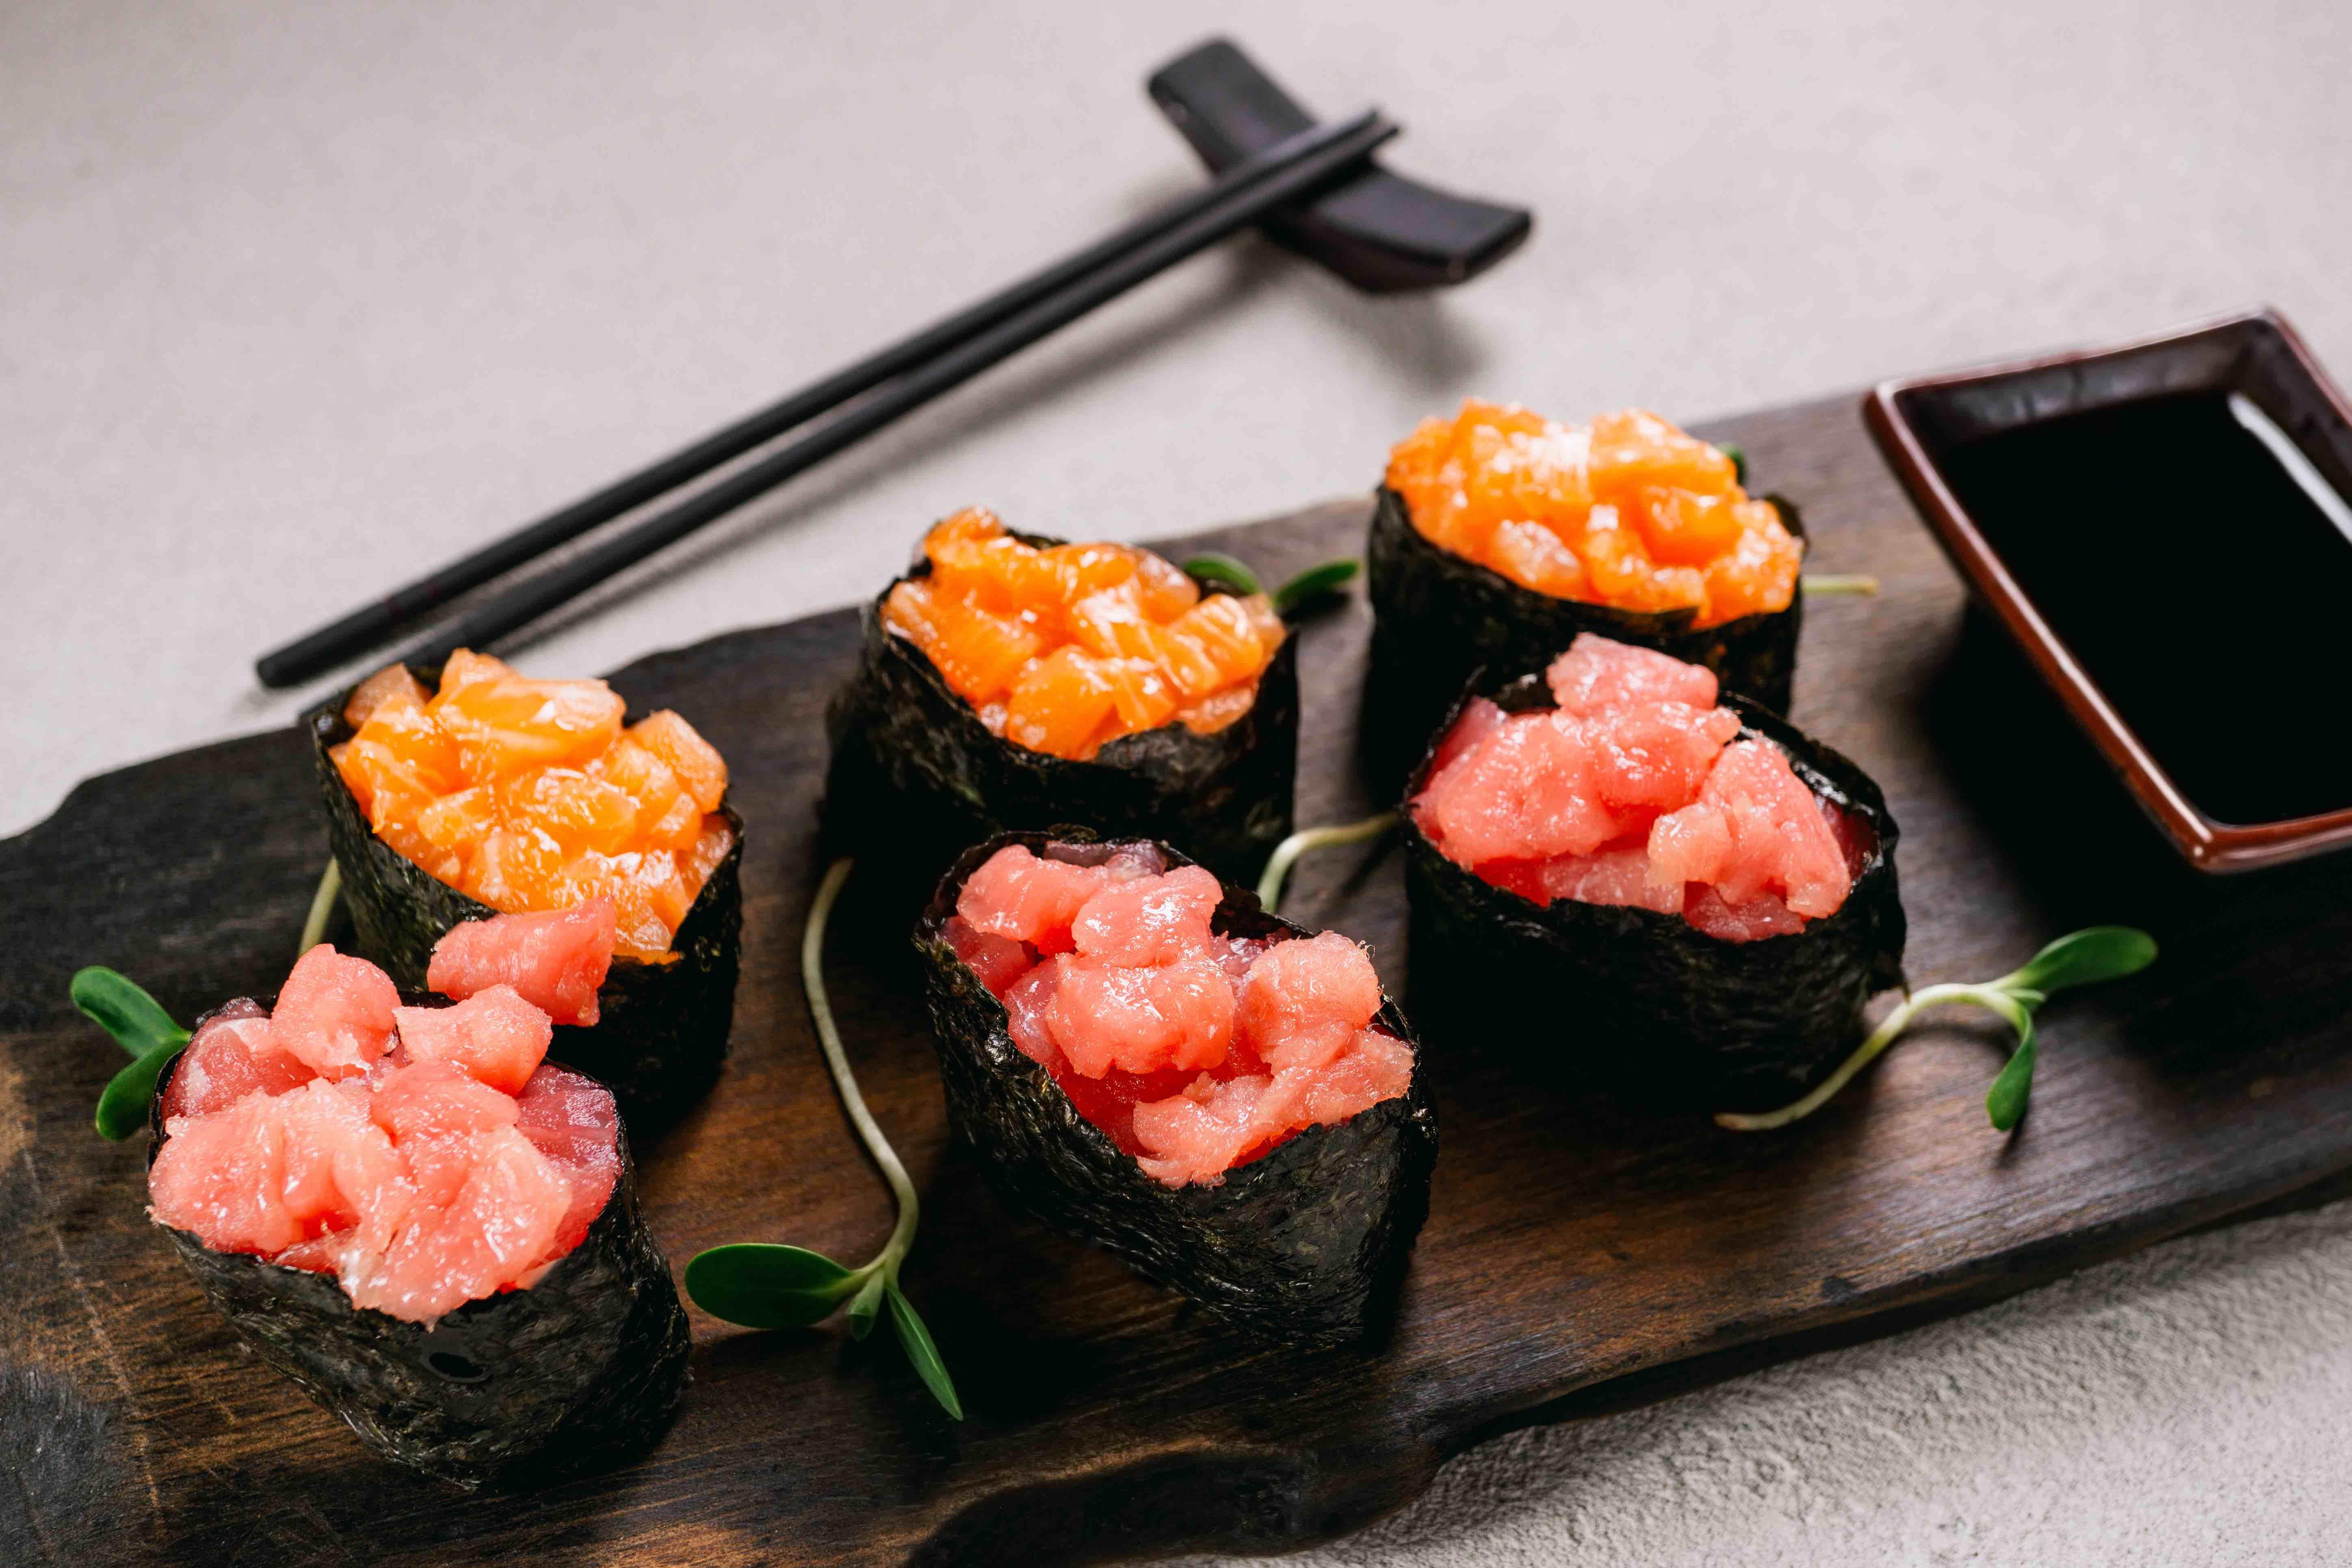 1630249686 56 otlichija sushi v japonii i drugih stranah chast 1 - ОТЛИЧИЯ СУШИ В ЯПОНИИ И ДРУГИХ СТРАНАХ   ЧАСТЬ 1